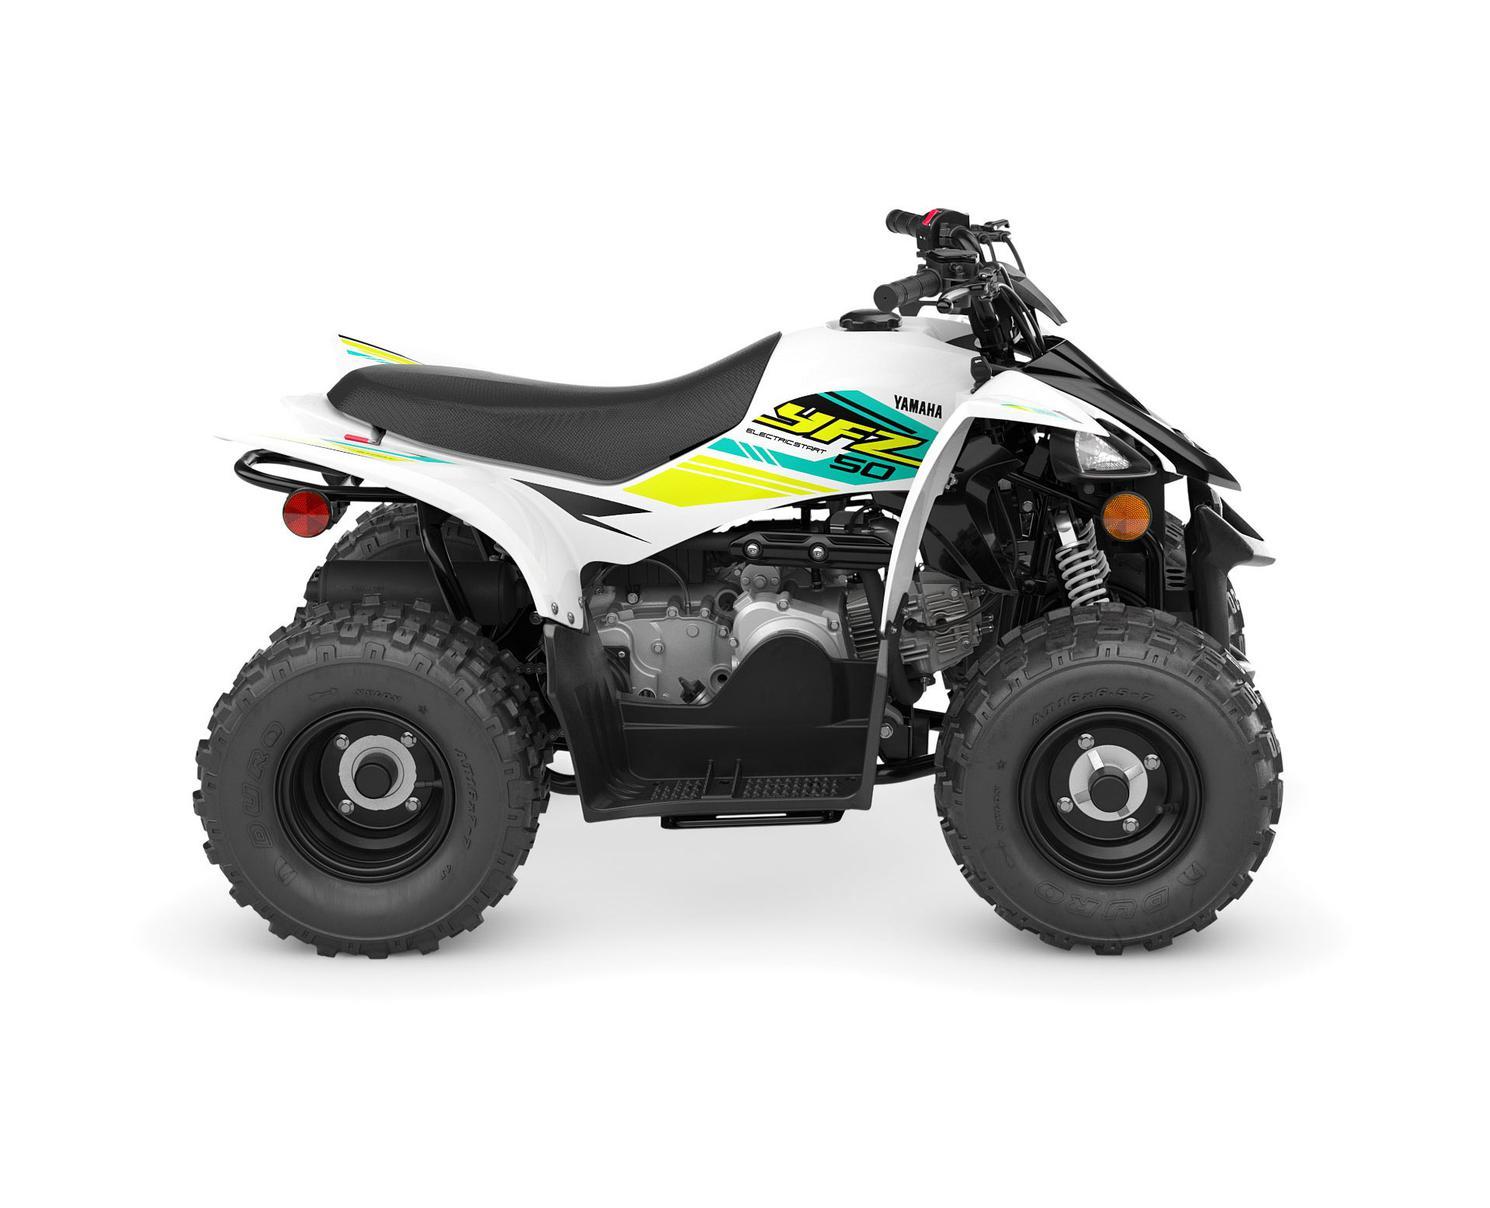 Yamaha YFZ50 Noir/Blanc 2022